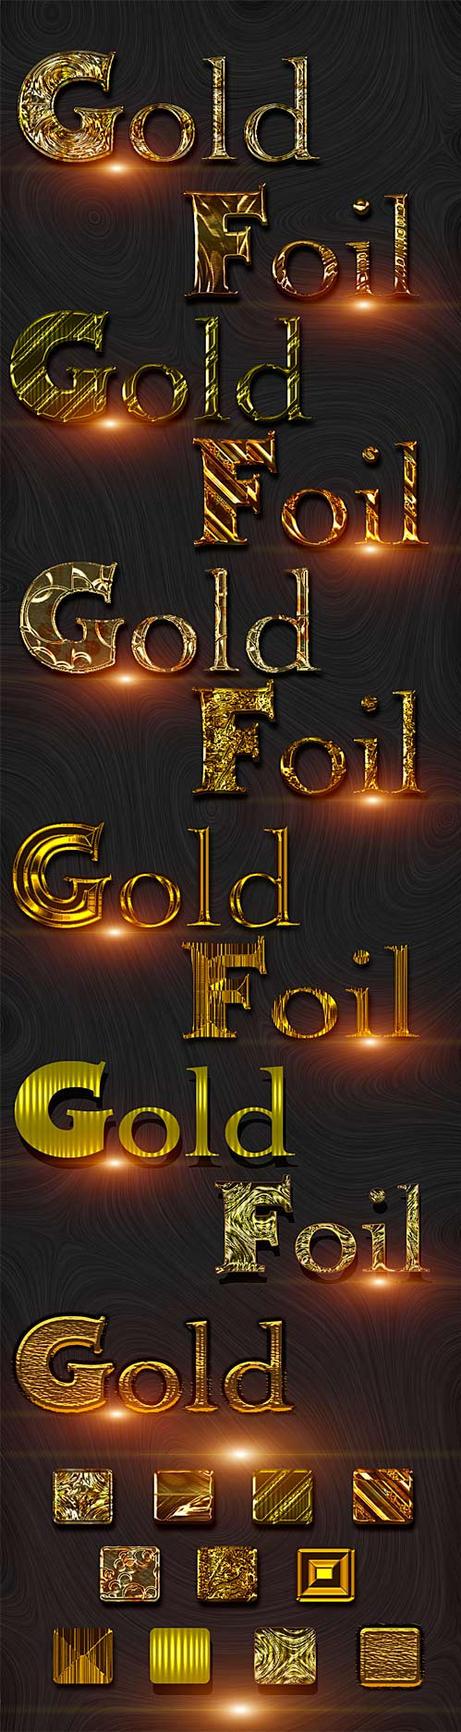 Golden Foil styles by DiZa-74